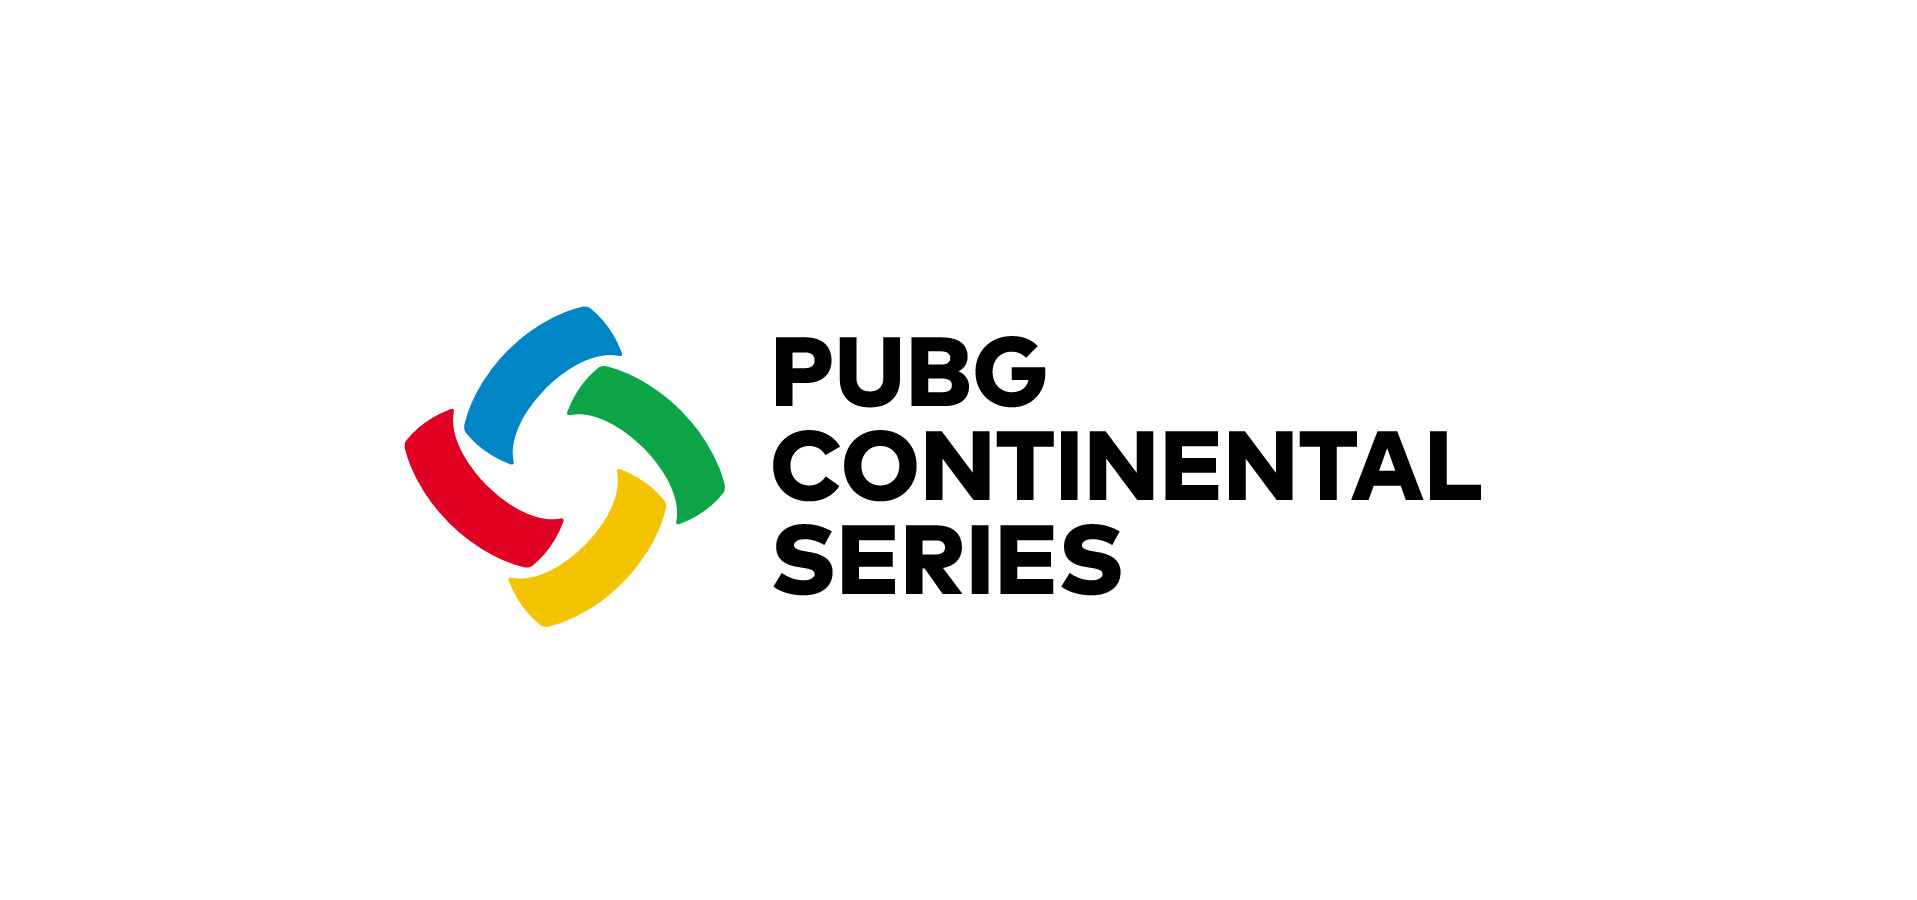 PUBG Corporation's PUBG Continental Series logo